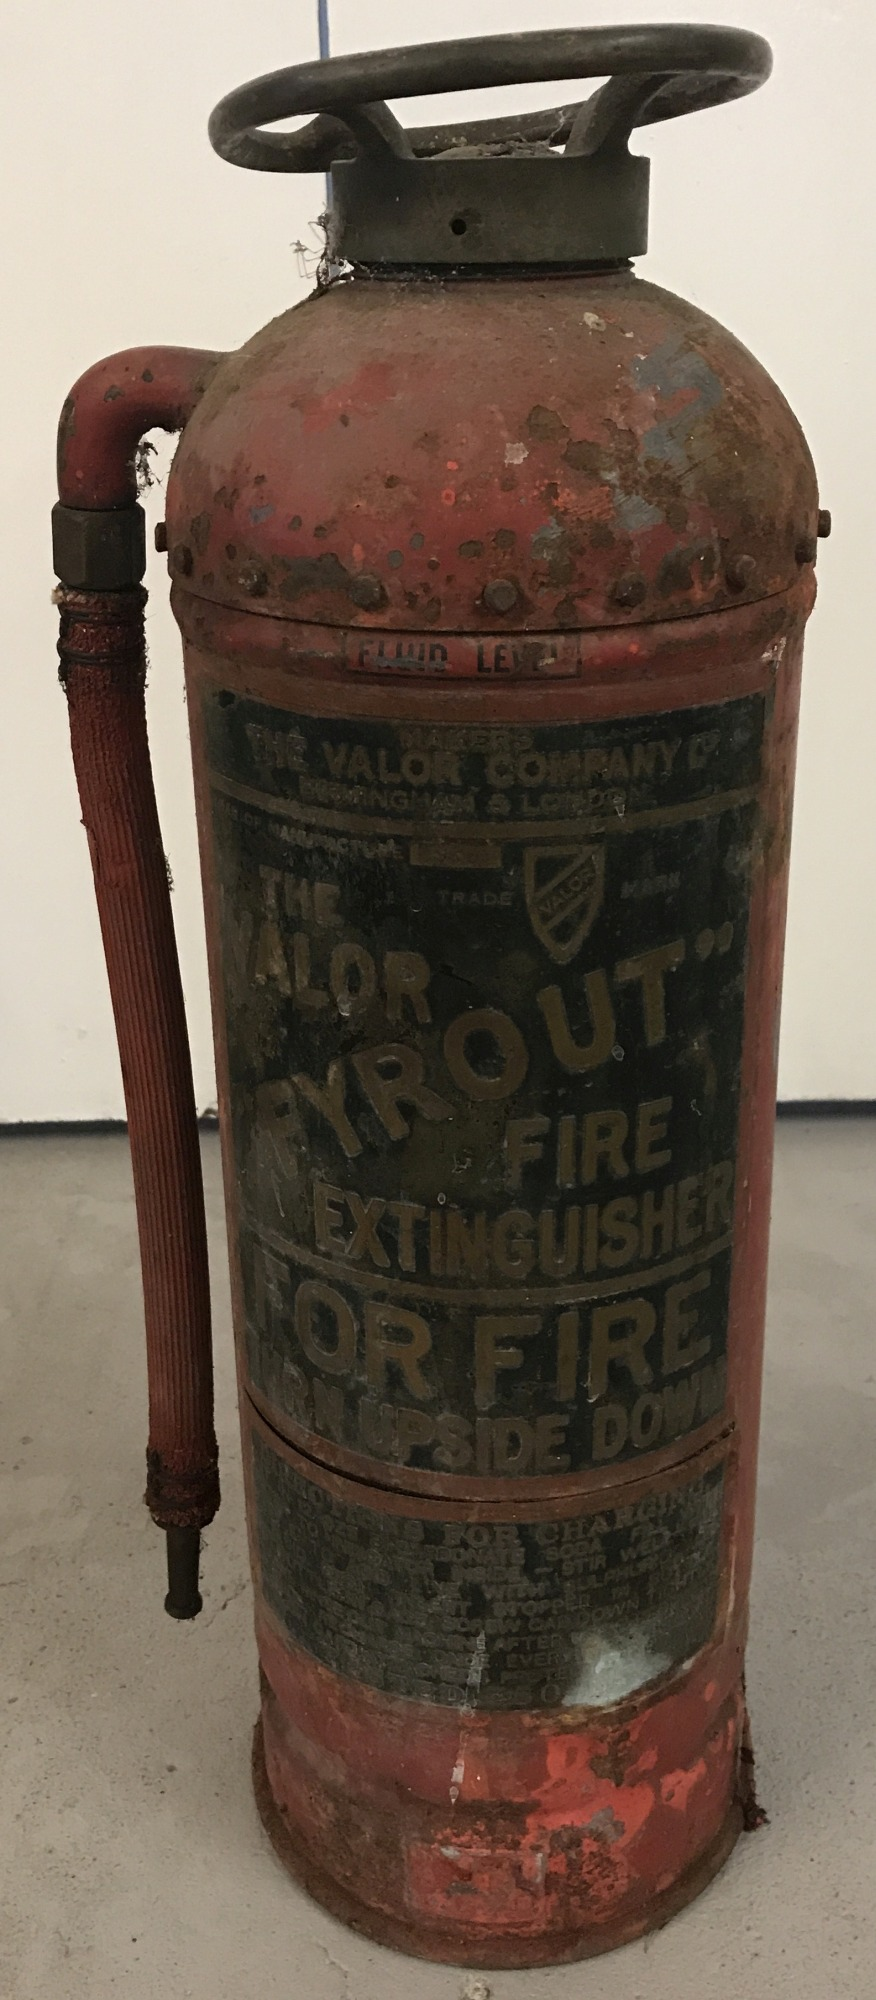 "A vintage red Valor ""Fyrout"" extinguisher, with original hose attachment."